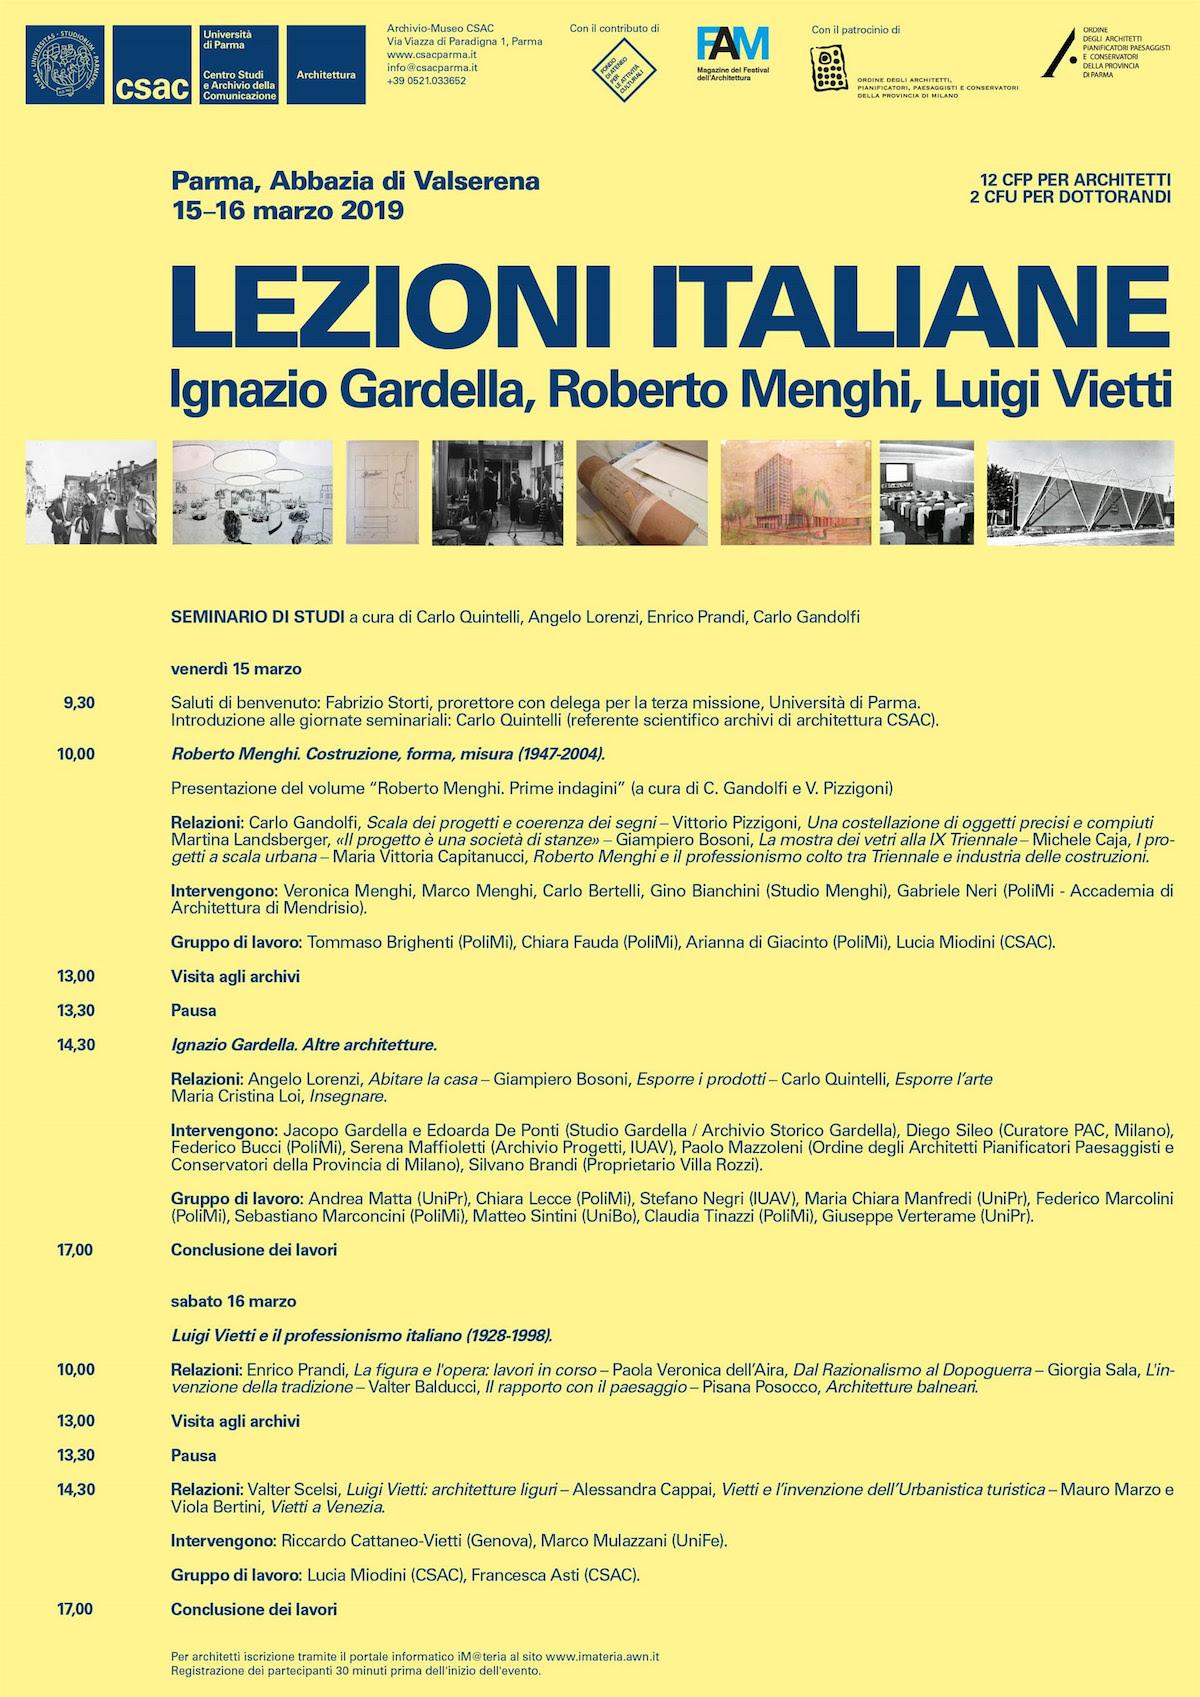 Lezioni Italiane csac